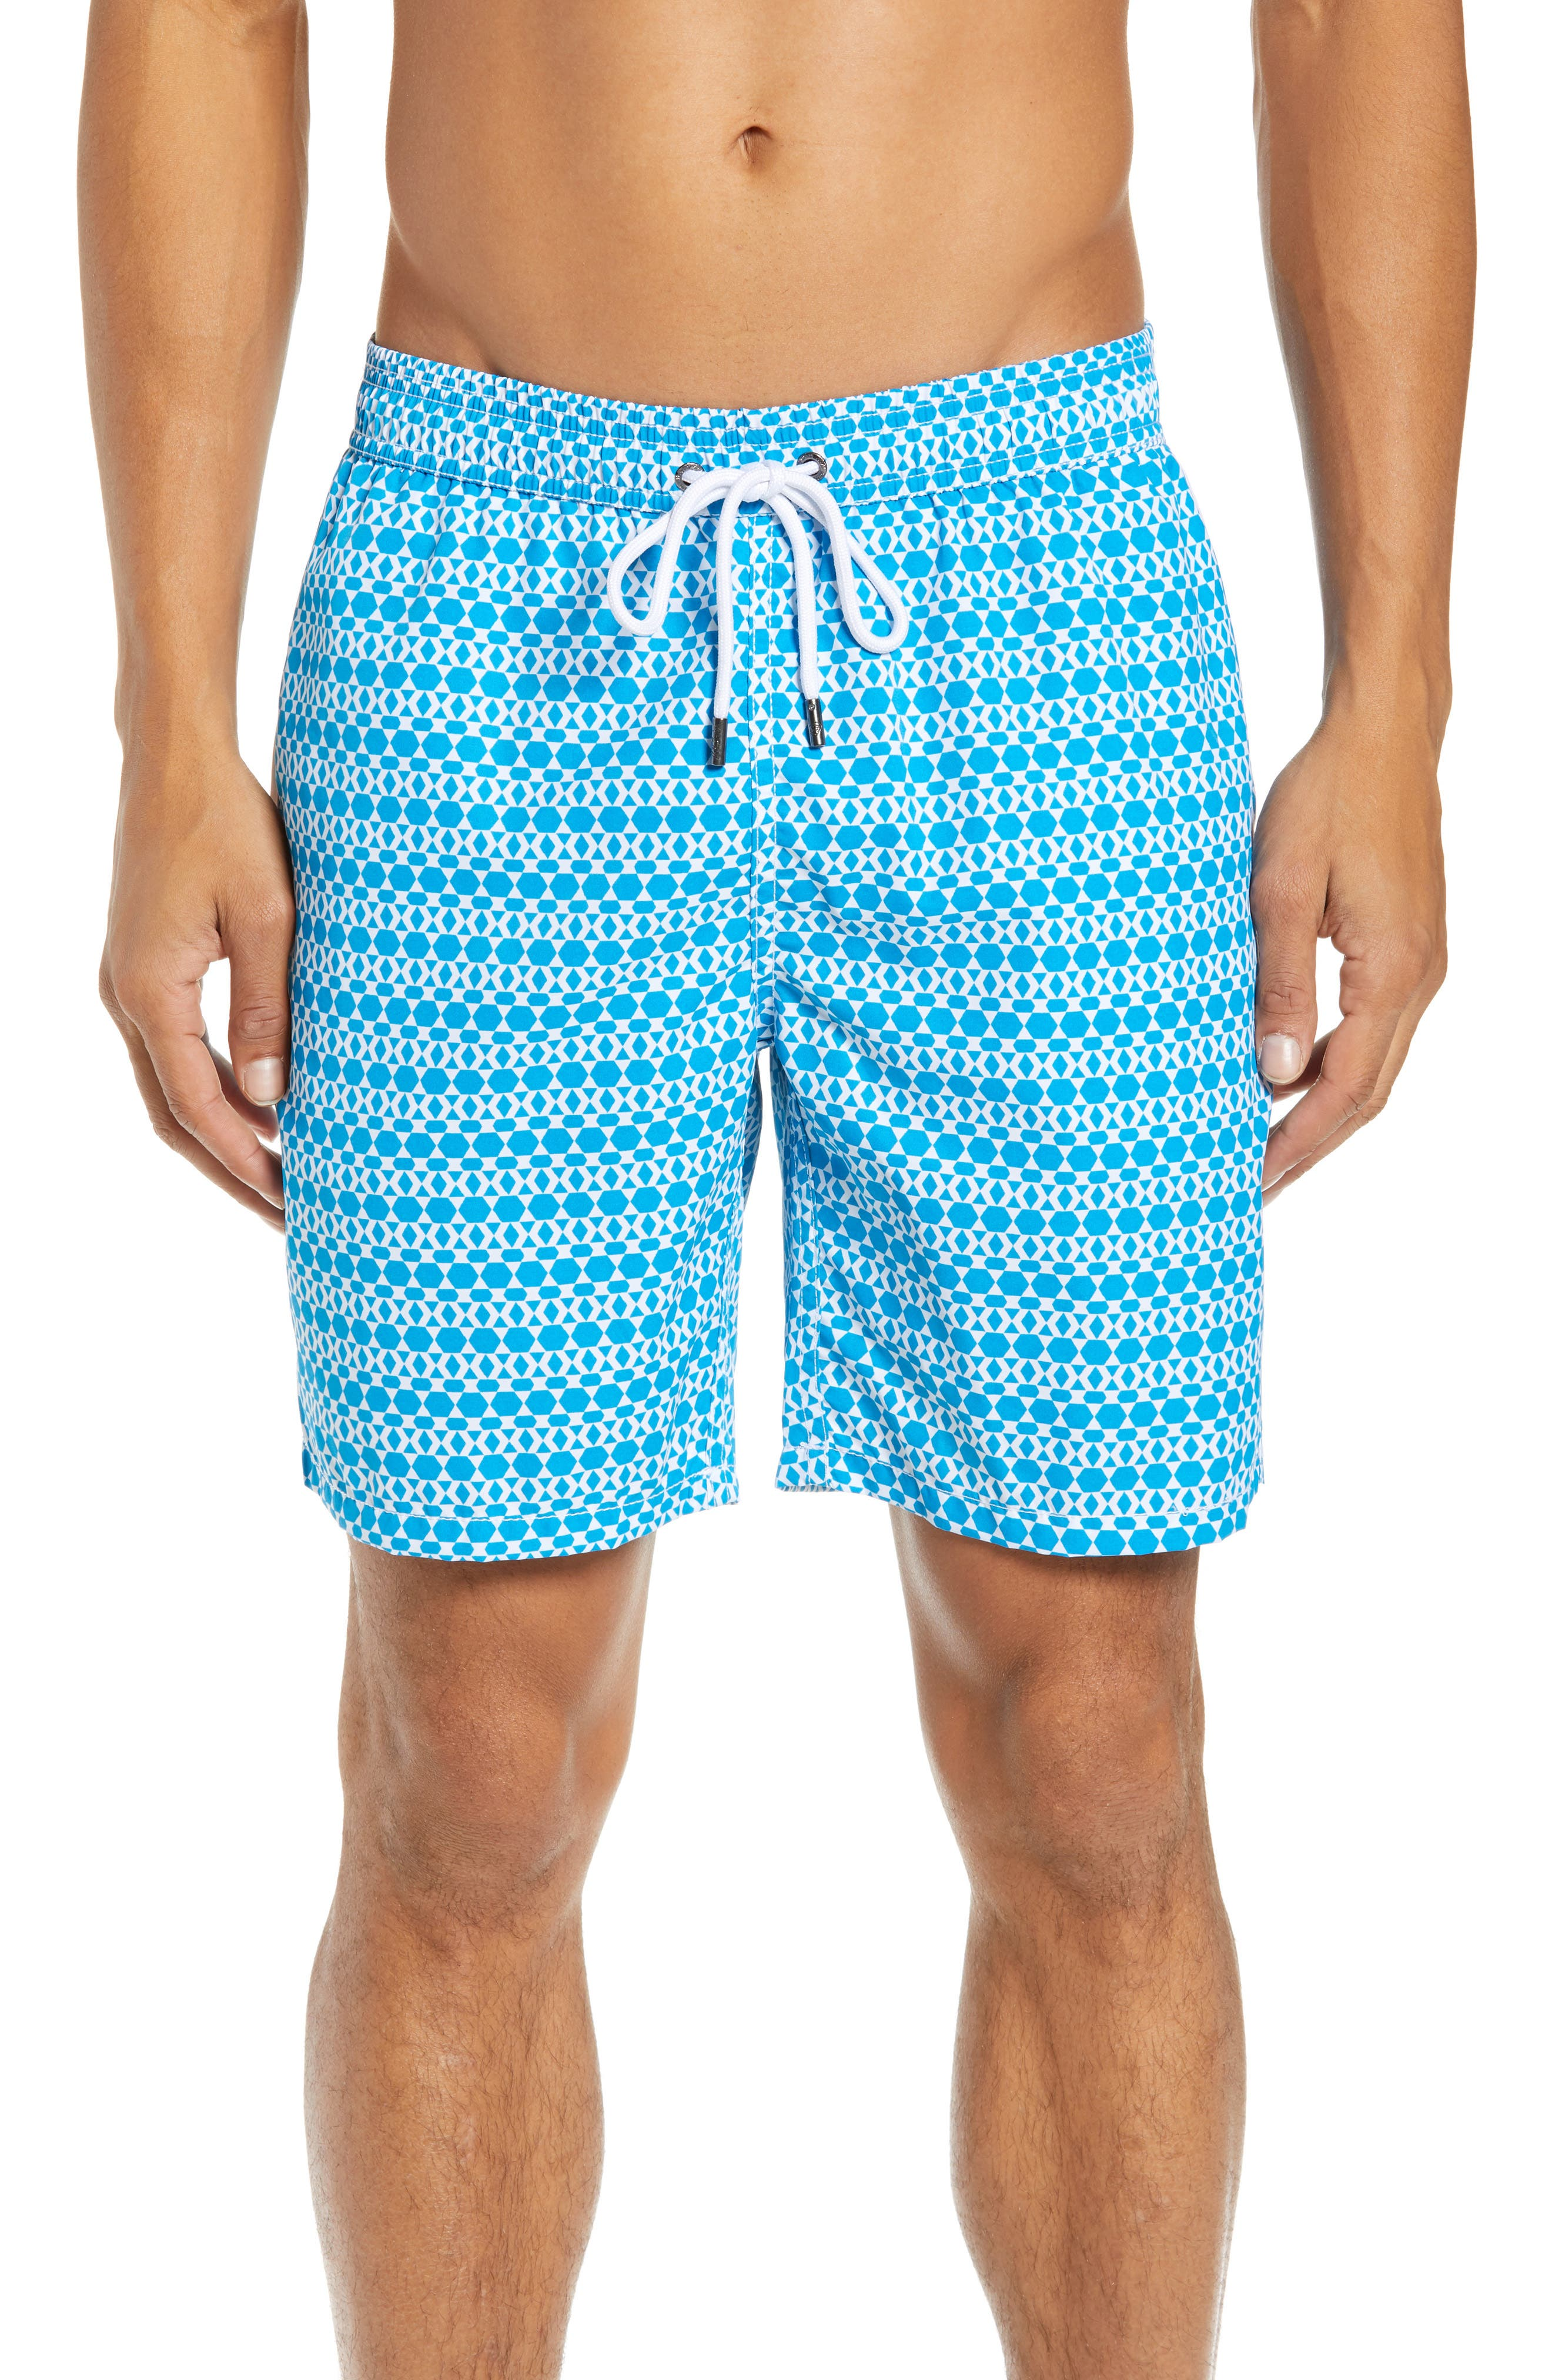 Mr. Swim Hexagon Stripe Swim Trunks,                         Main,                         color, NAVY